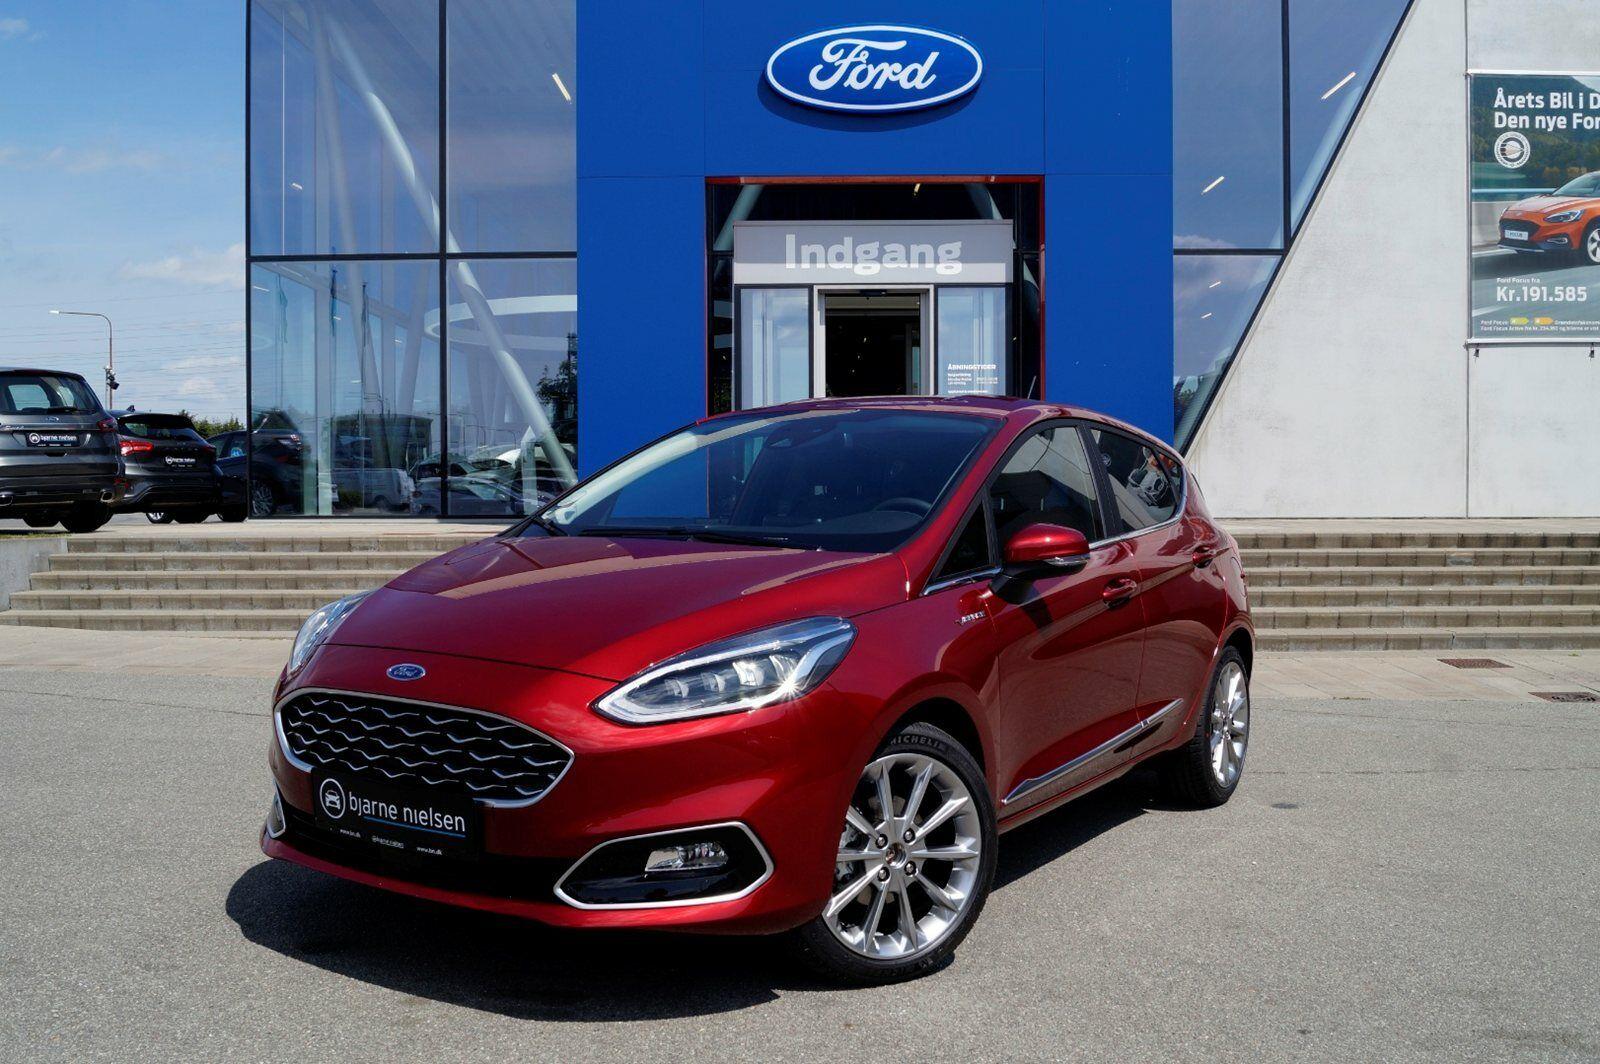 Ford Fiesta 1,0 SCTi 140 Vignale